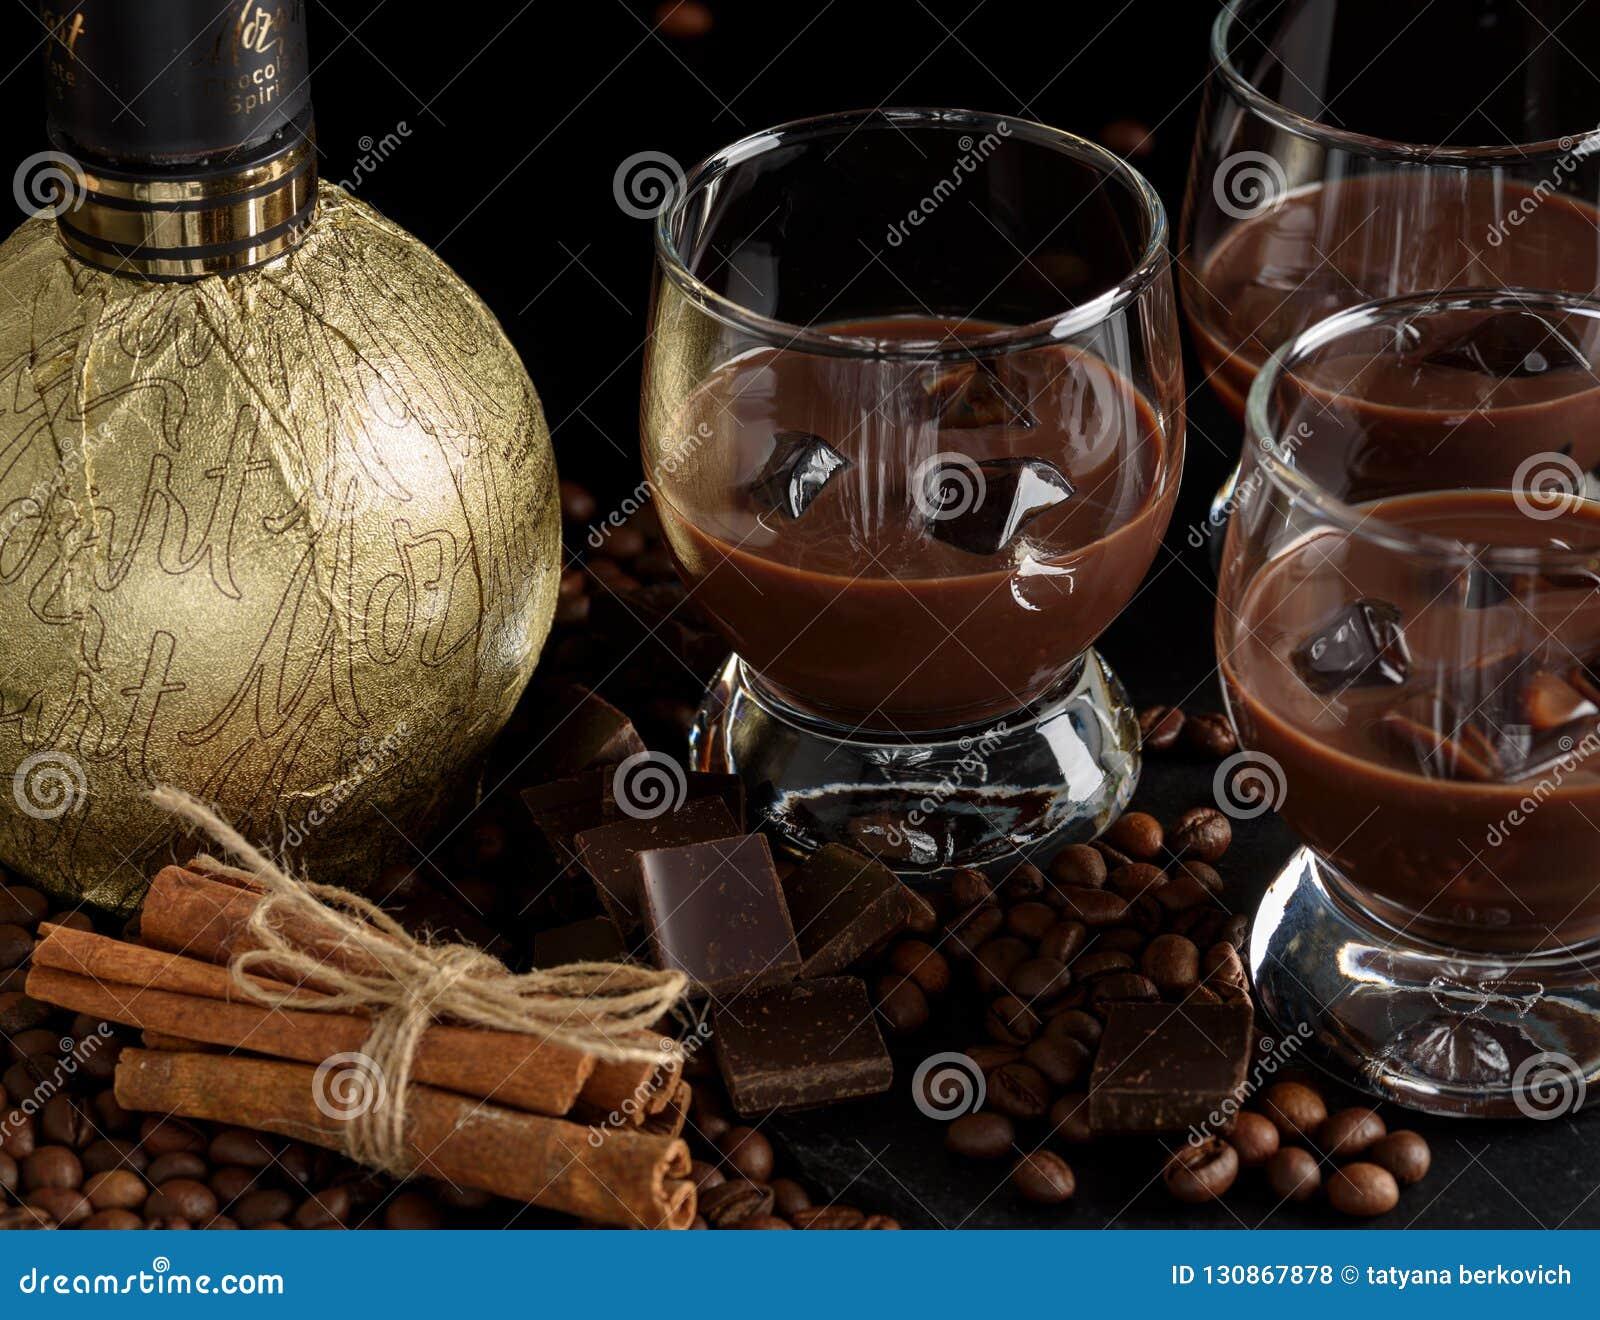 Chocolate and Coffee Cream Liqueur 17%  |Chocolate Coffee Liqueur